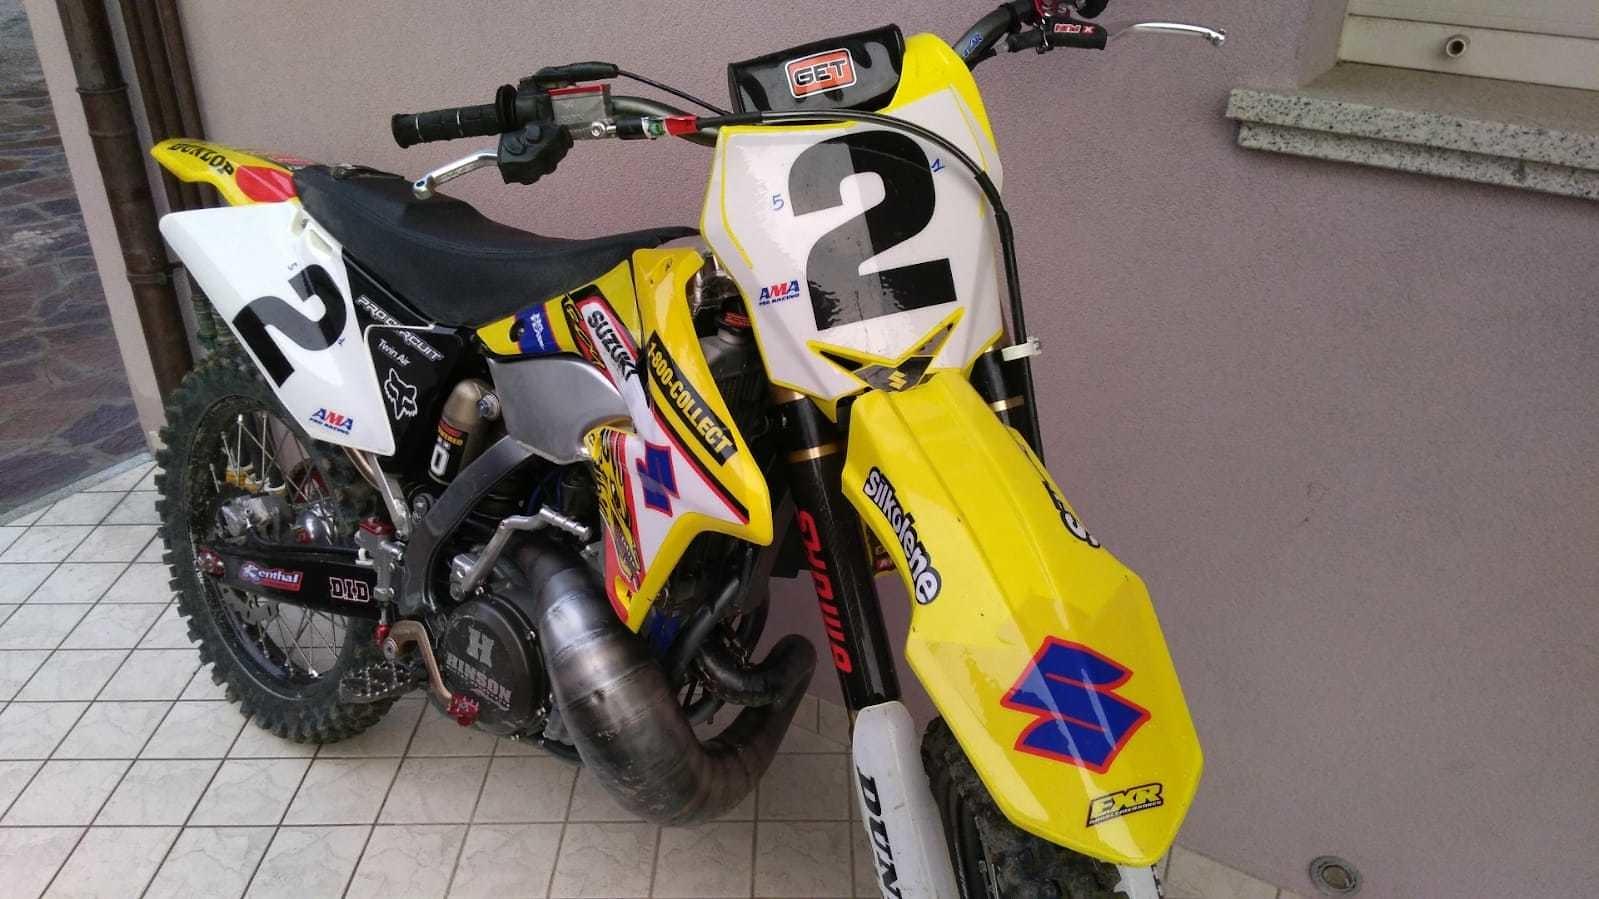 35f771a7-cb62-4405-a127-c3498b626327 - effettoxtremo - Motocross Pictures - Vital MX